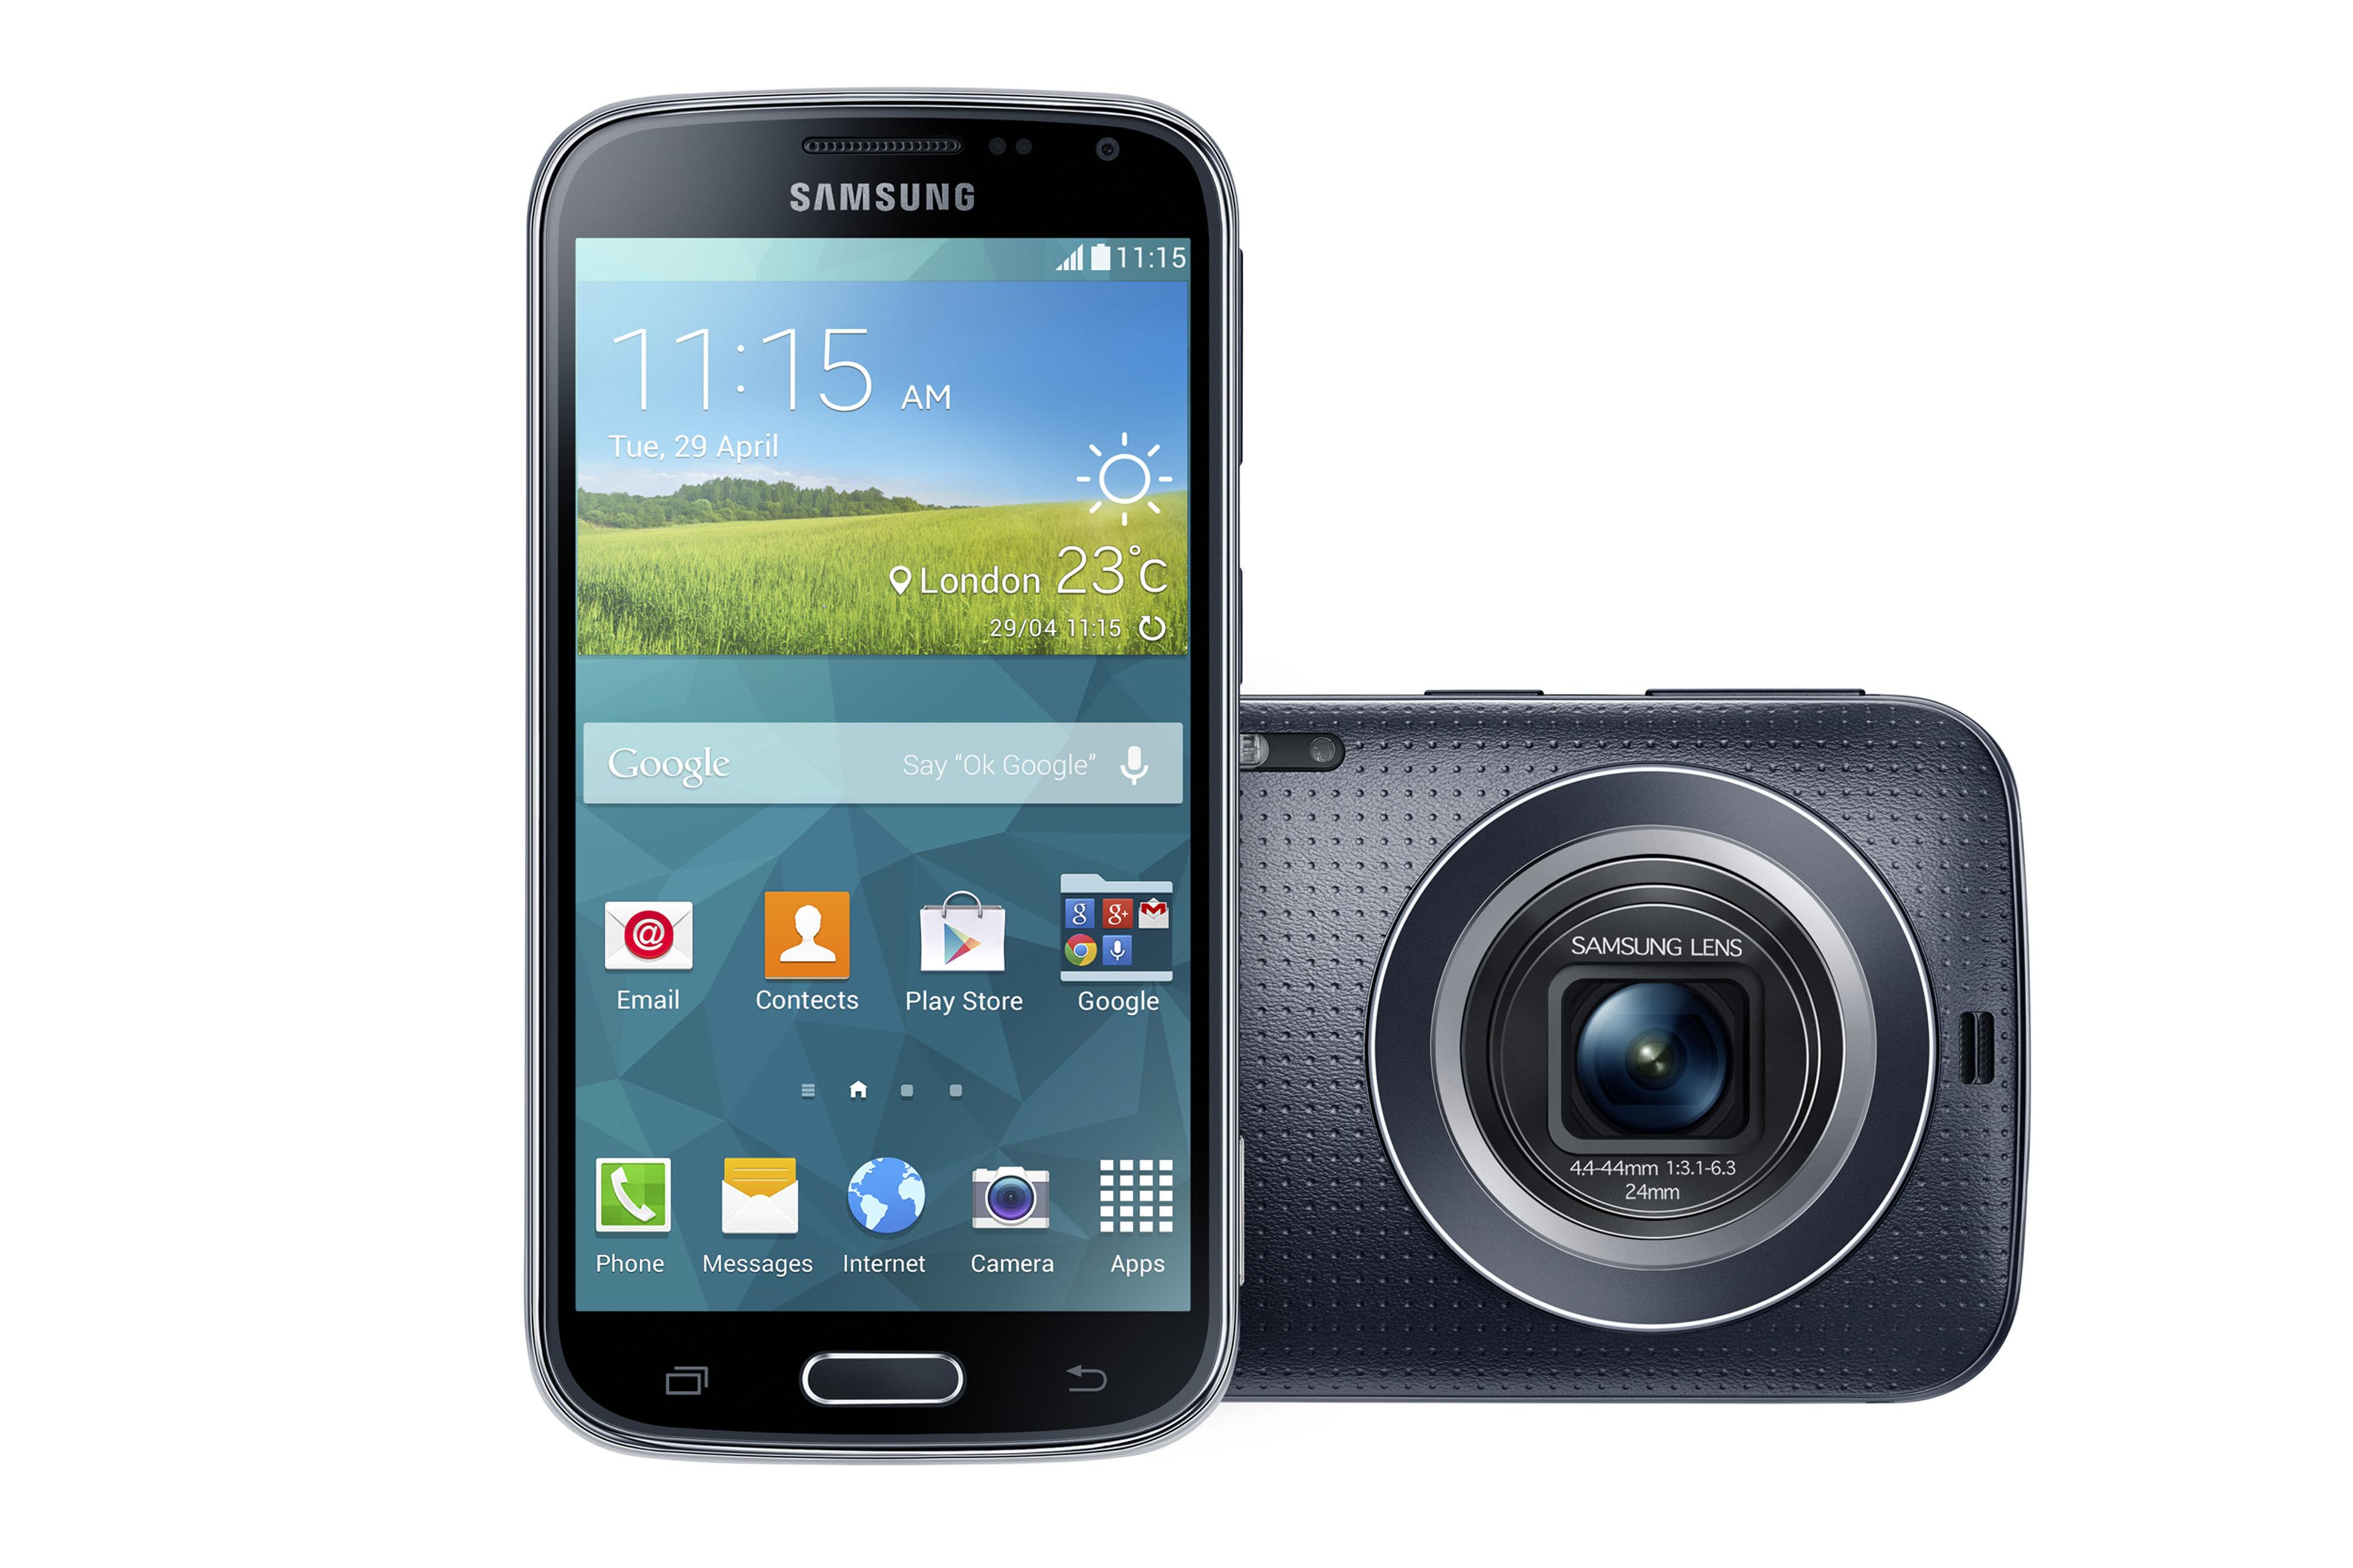 Galaxy K zoom_Charcoal Black_900px